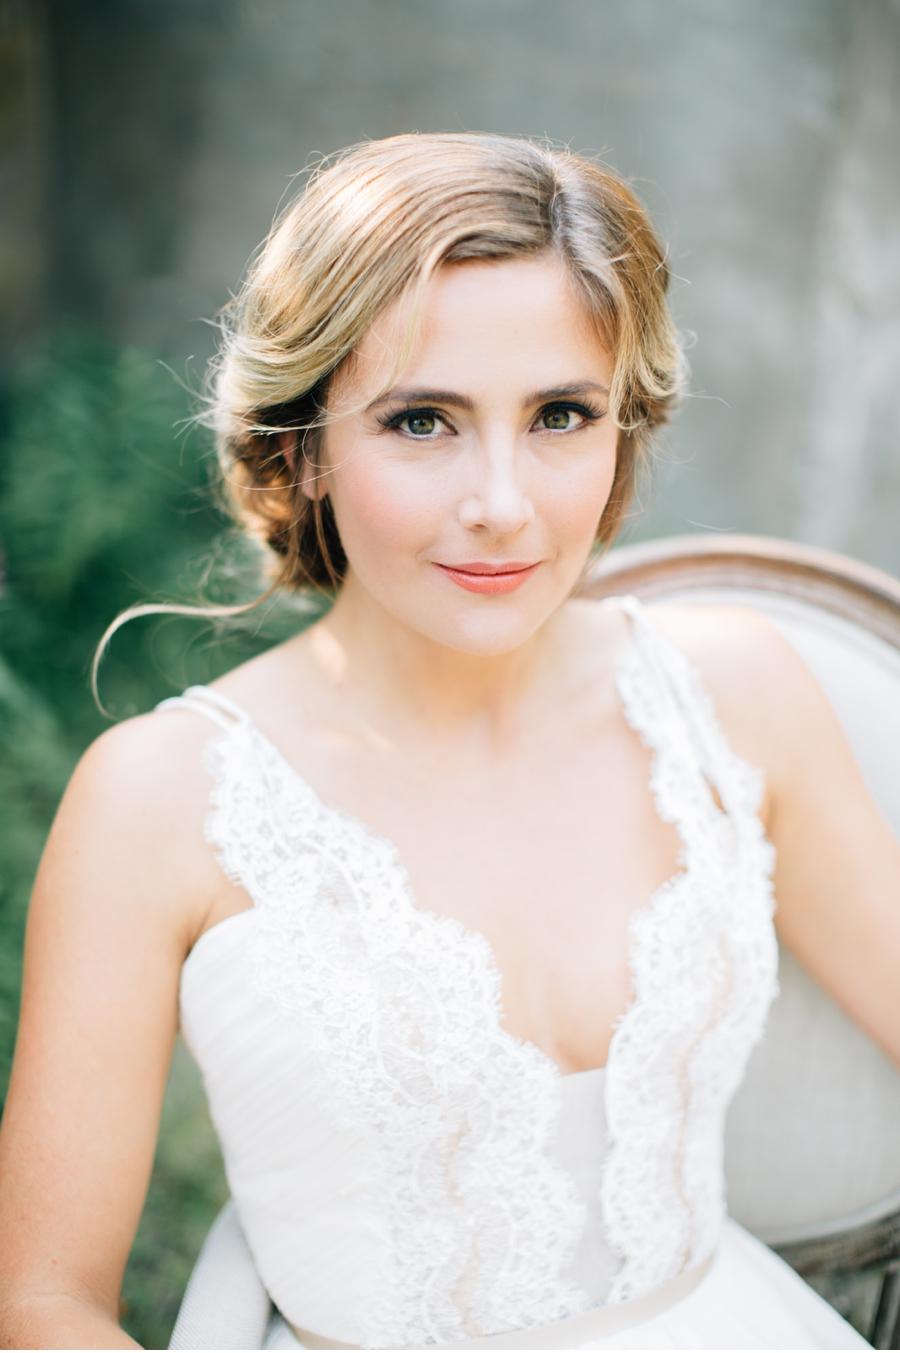 Canmore-Fine-Art-Wedding-Inspiration